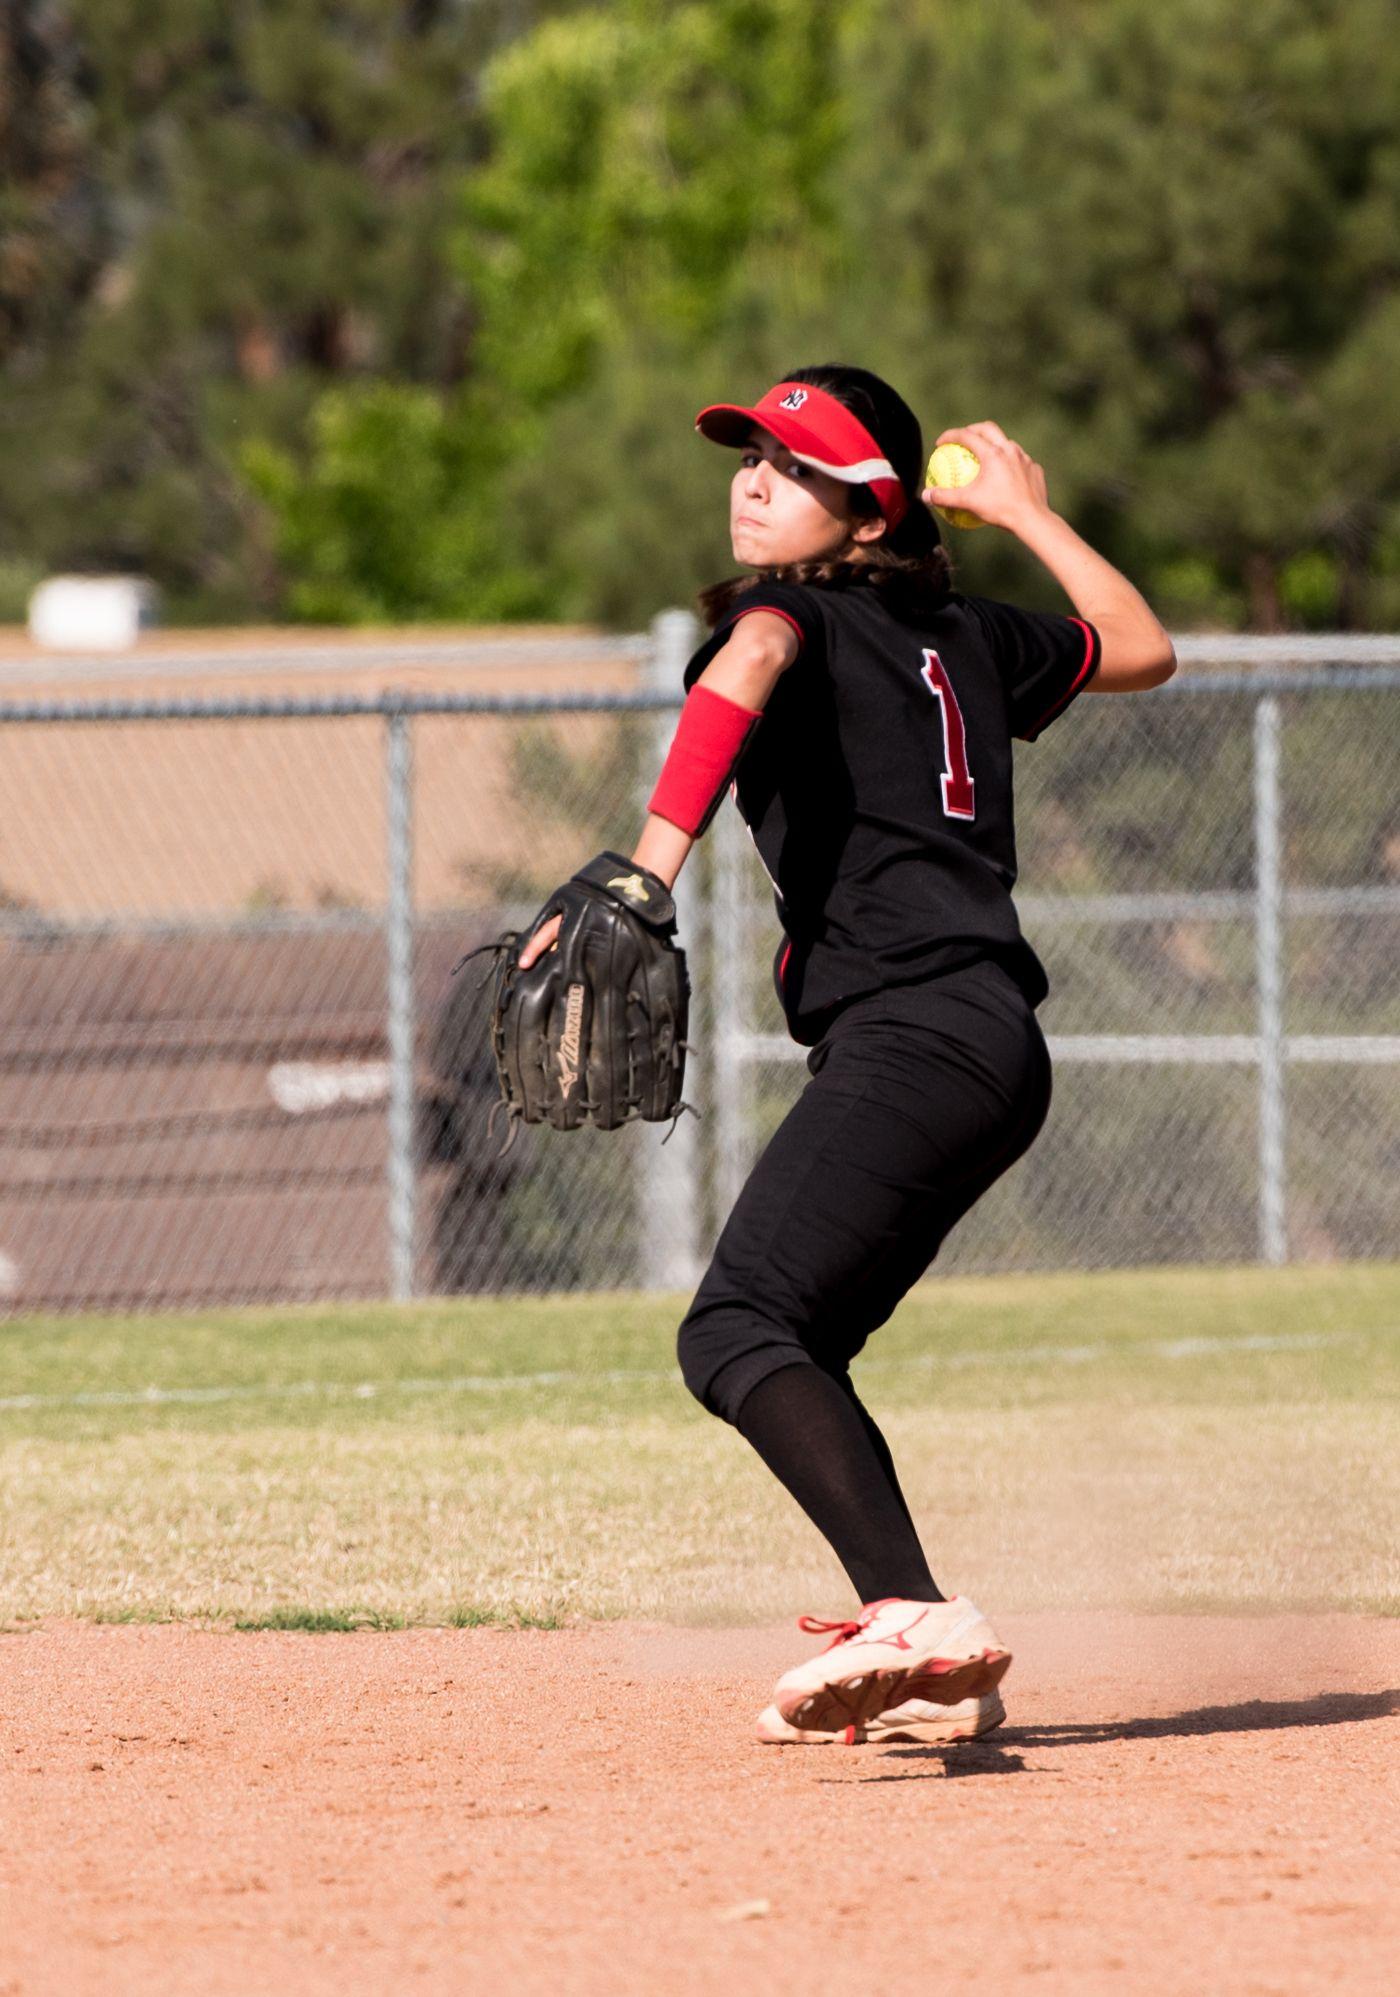 Norte Vista High School Softball School Softball High School Softball Sports Photography